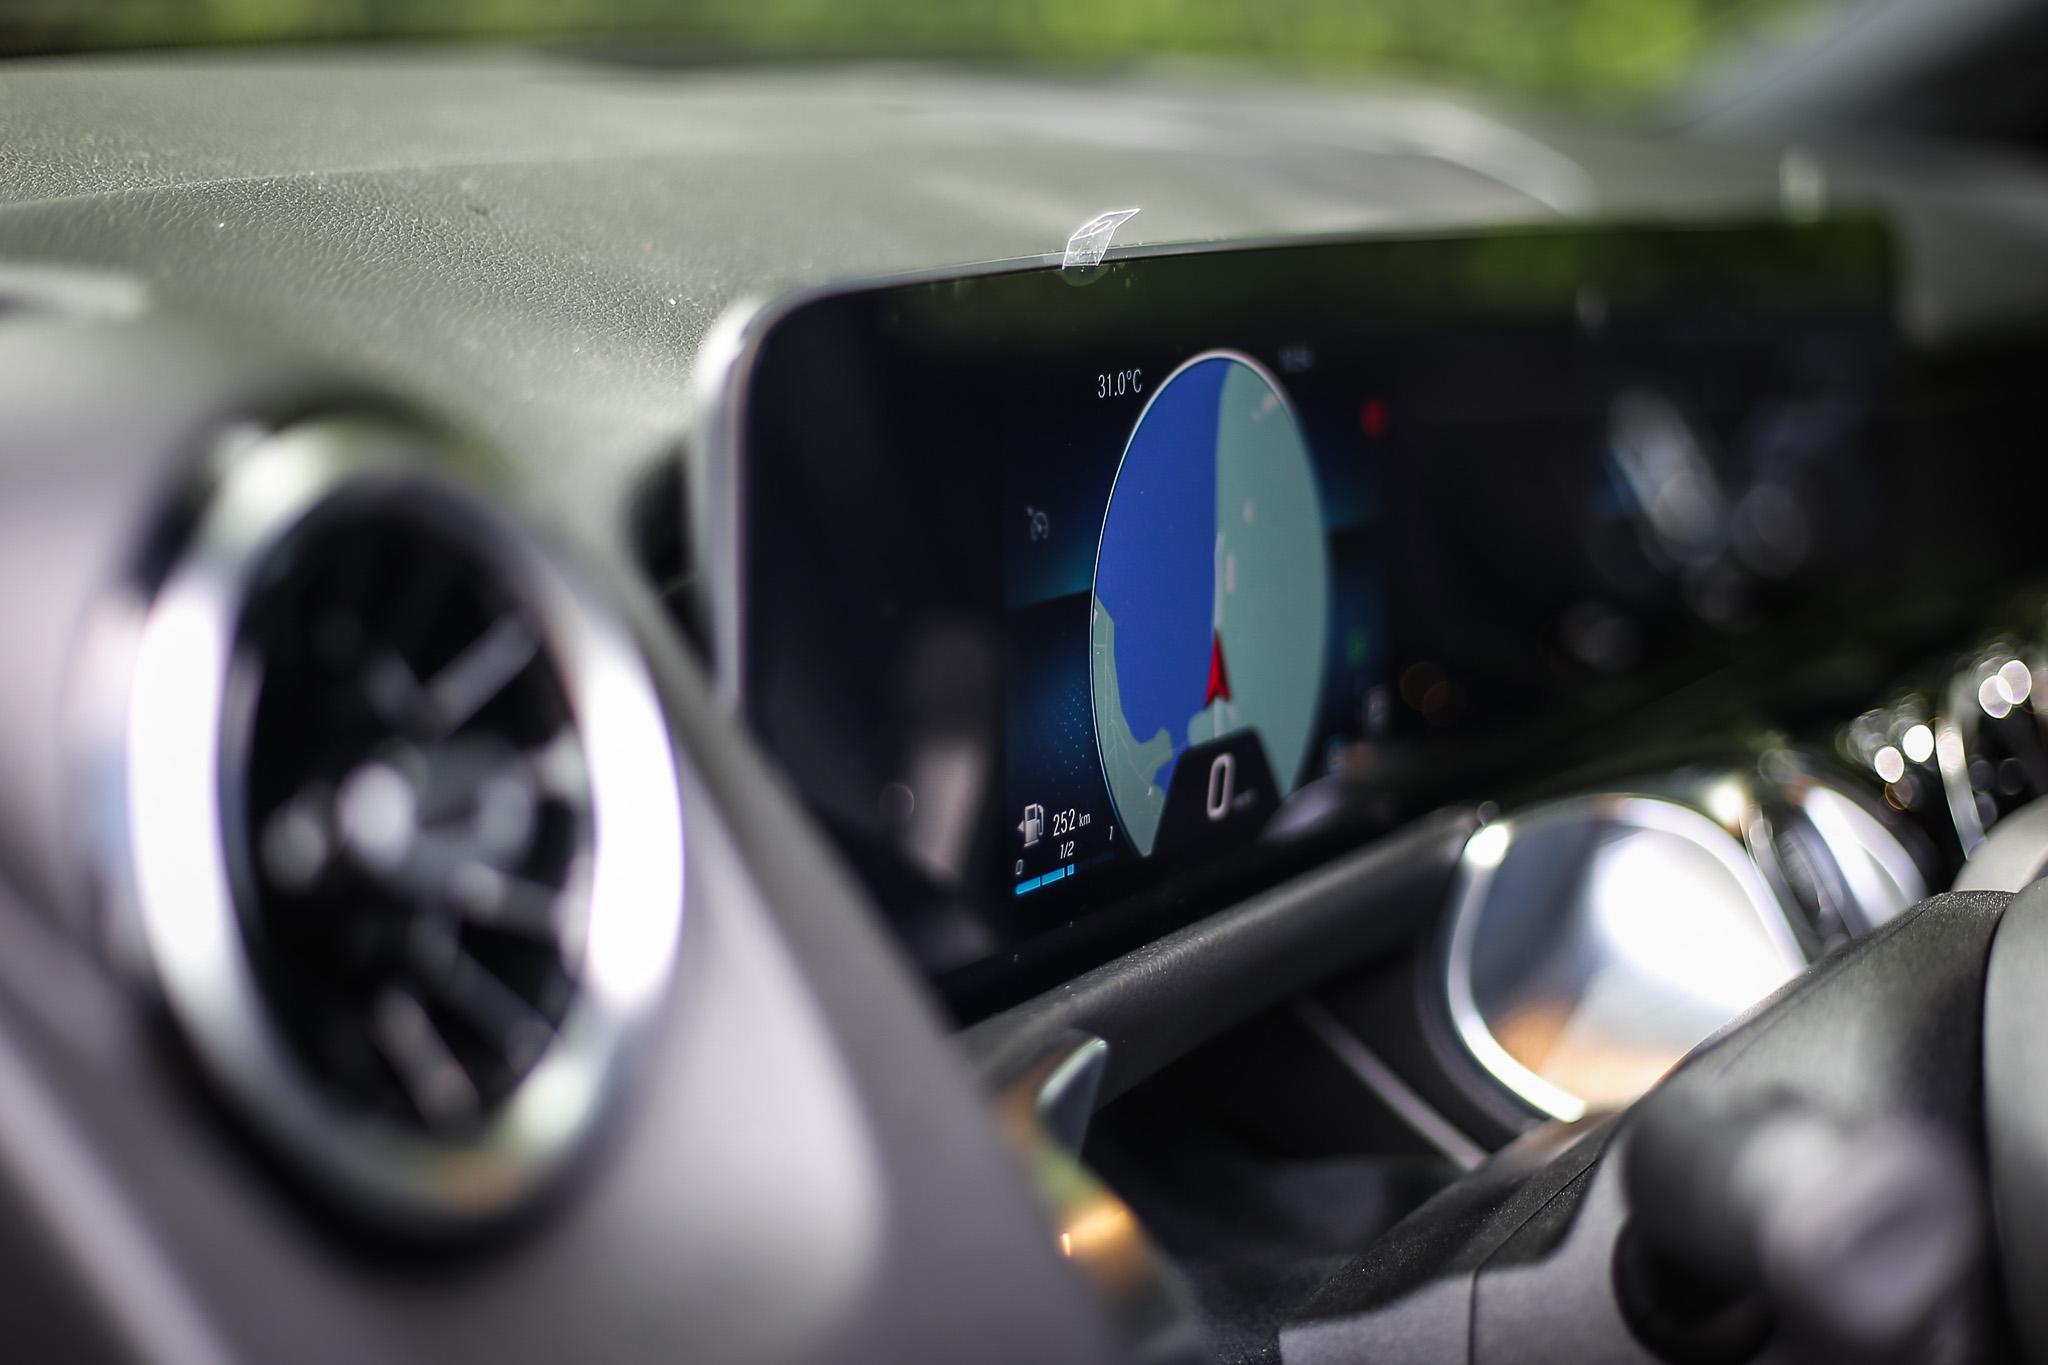 MBUX多媒體系統由兩個10.25吋螢幕組成(試駕車款為認證車,儀表螢幕僅為7吋)。